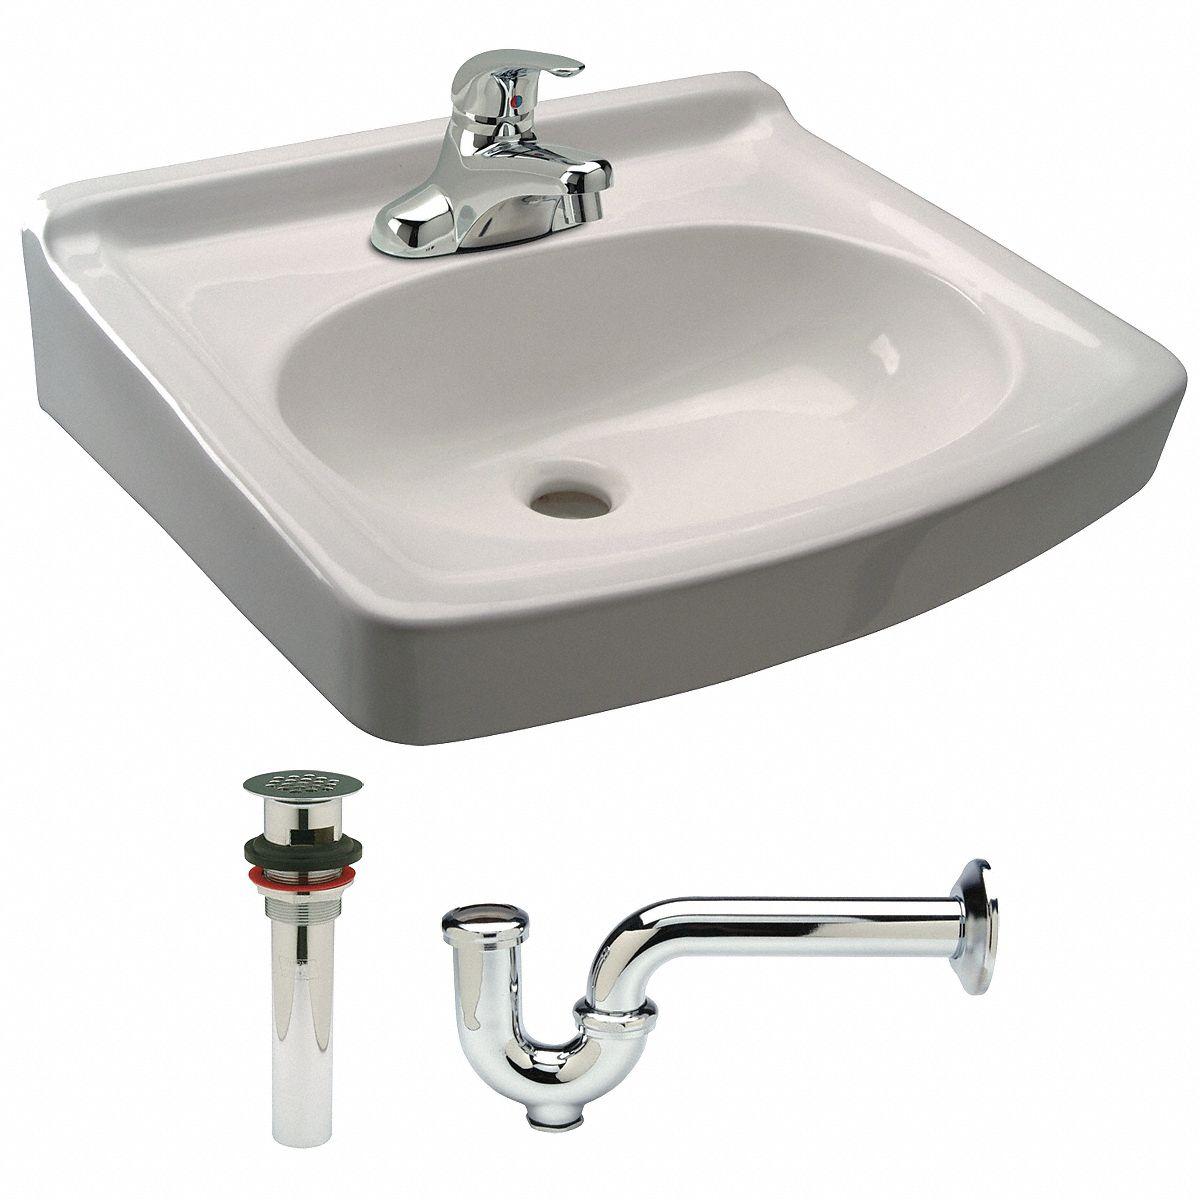 zurn pedastal sinks series 15 1 4 in x 10 3 4 in vitreous china bathroom sink kit